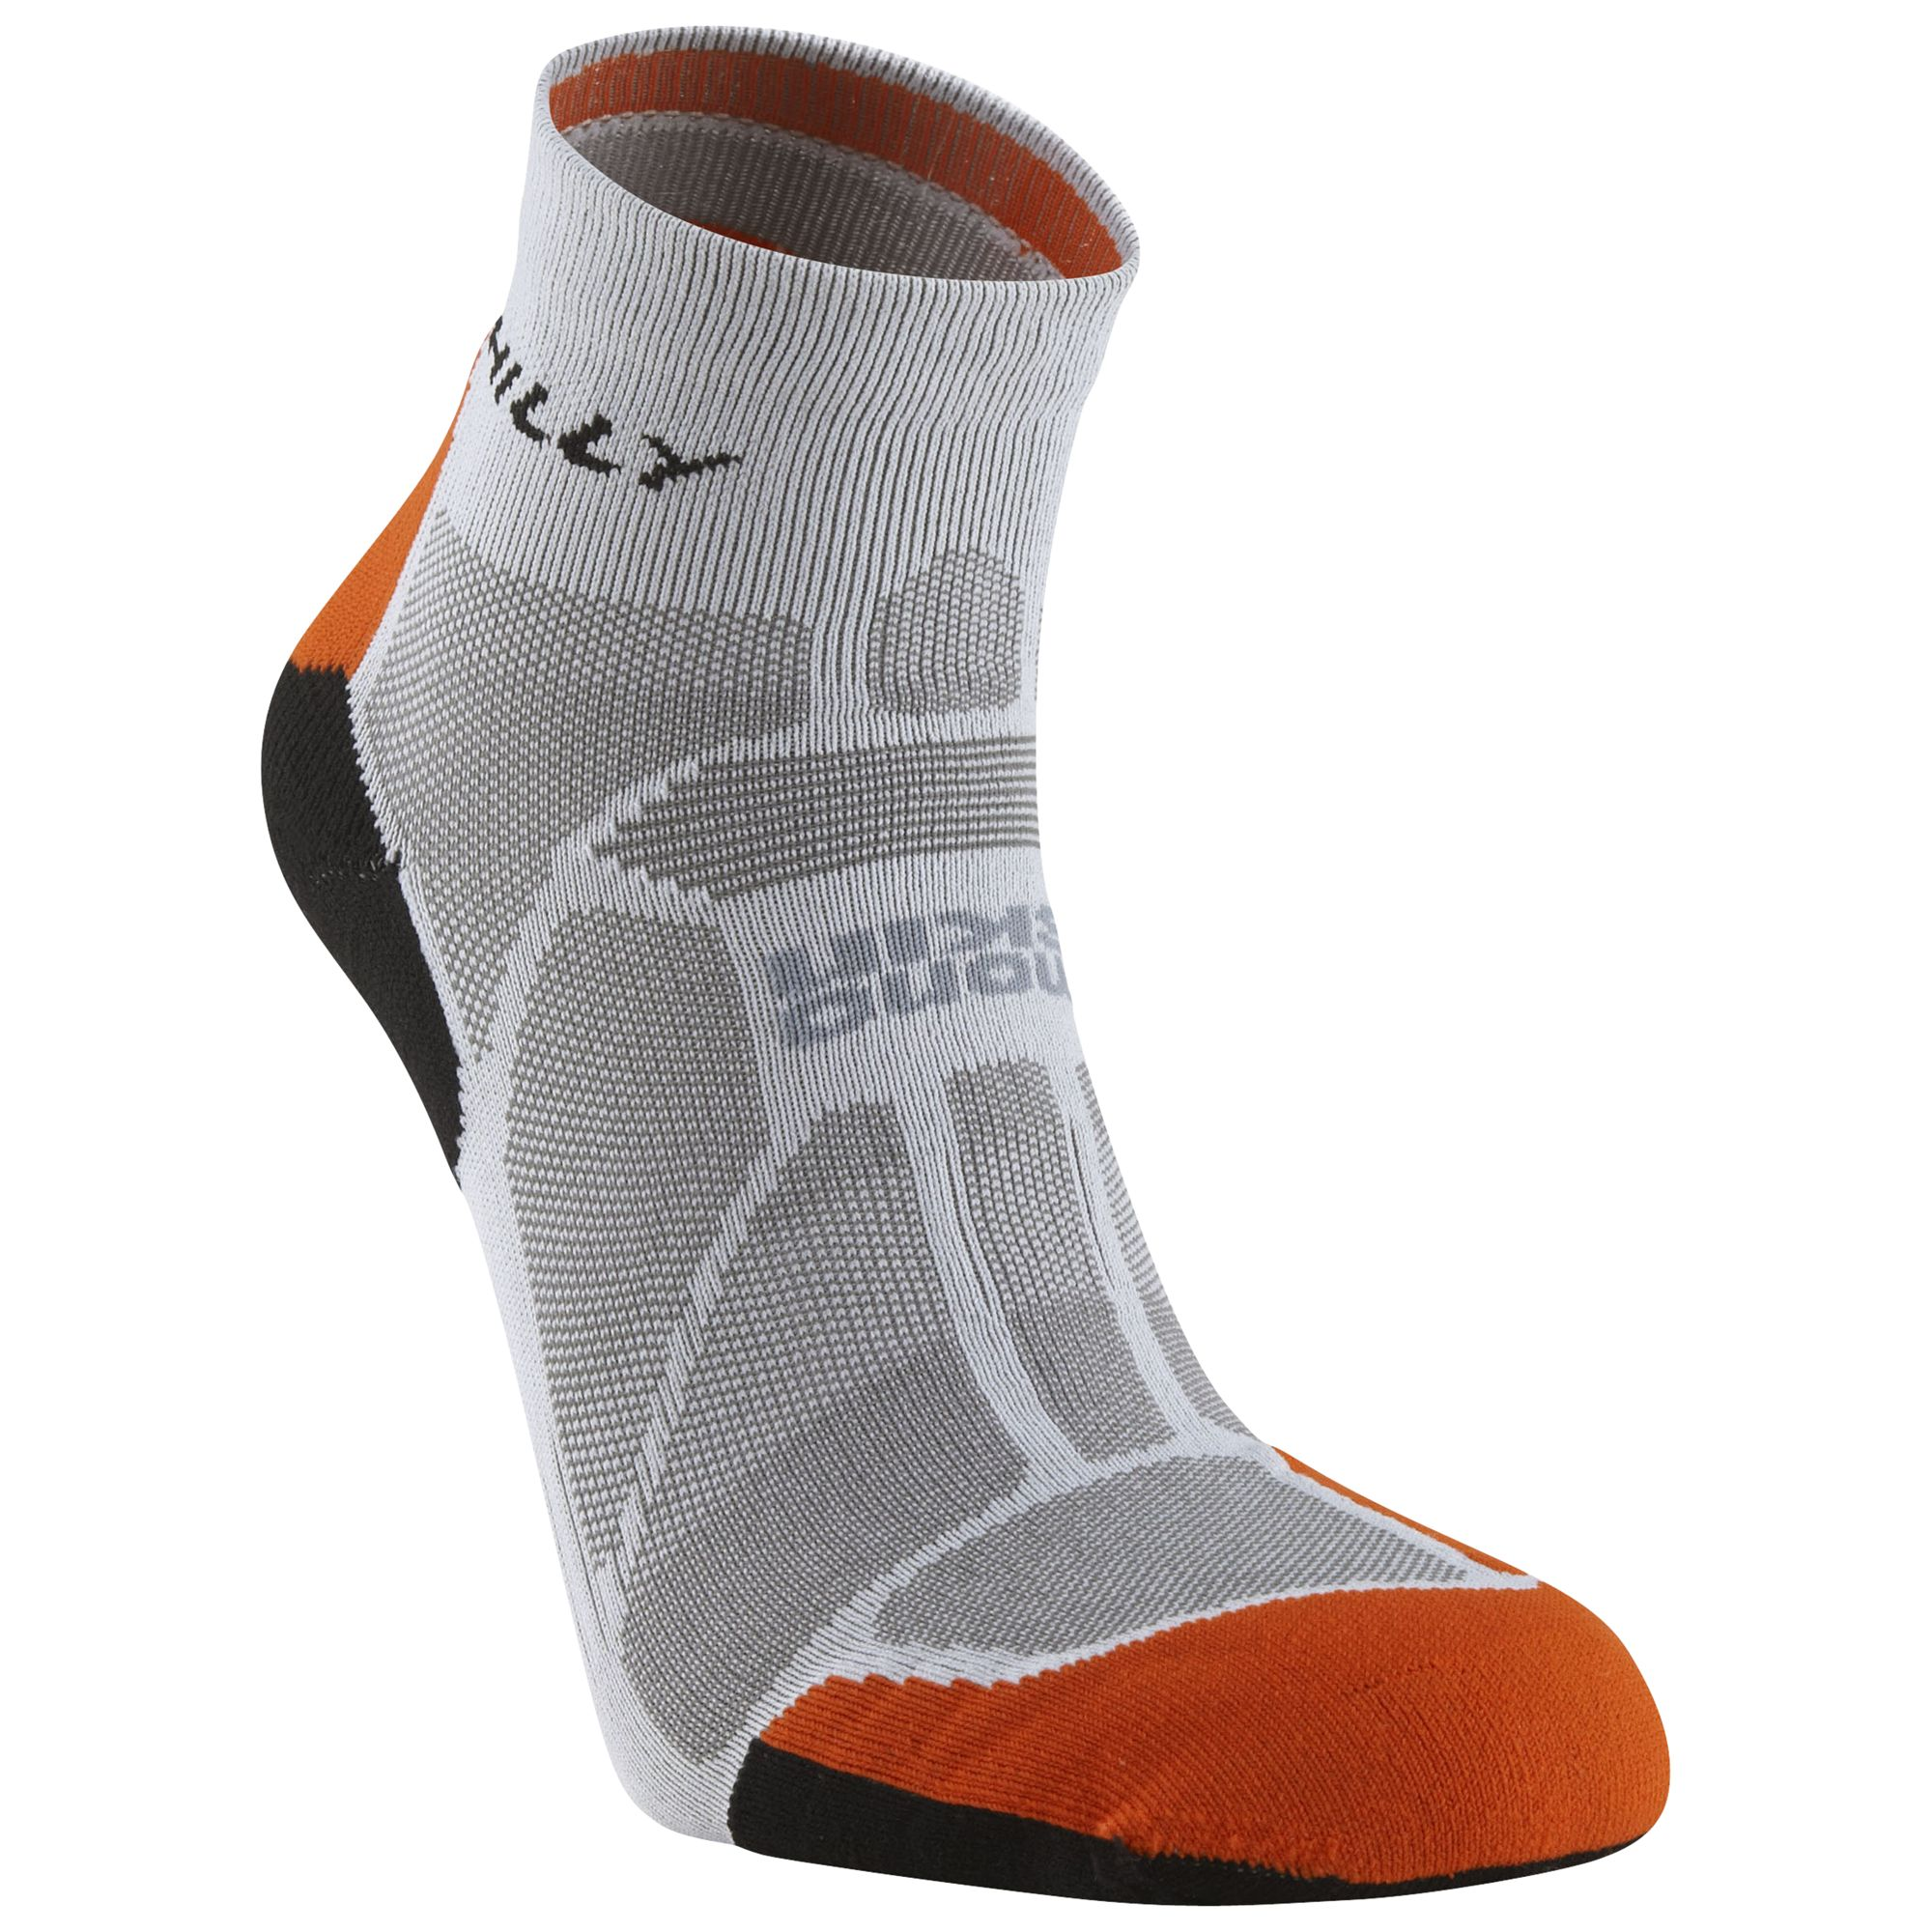 Hilly Hilly Marathon Fresh Anklet, Grey/Orange